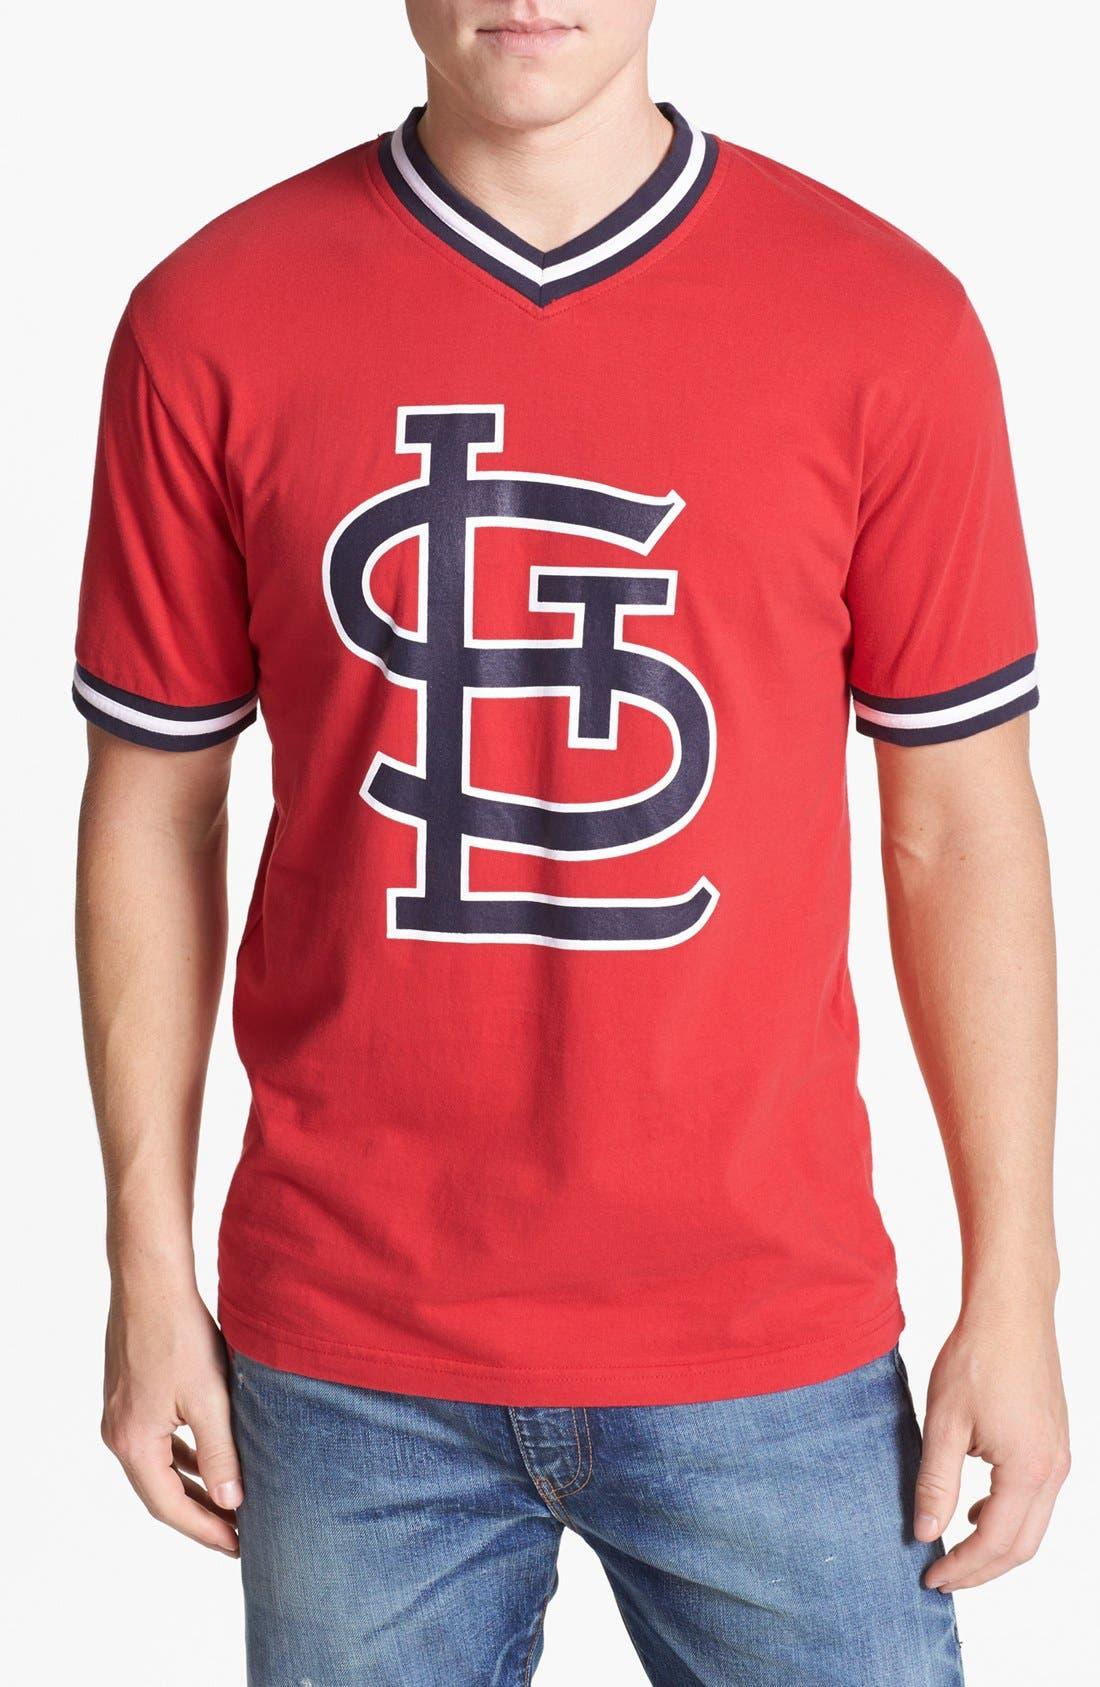 Main Image - Wright & Ditson 'St. Louis Cardinals' V-Neck T-Shirt